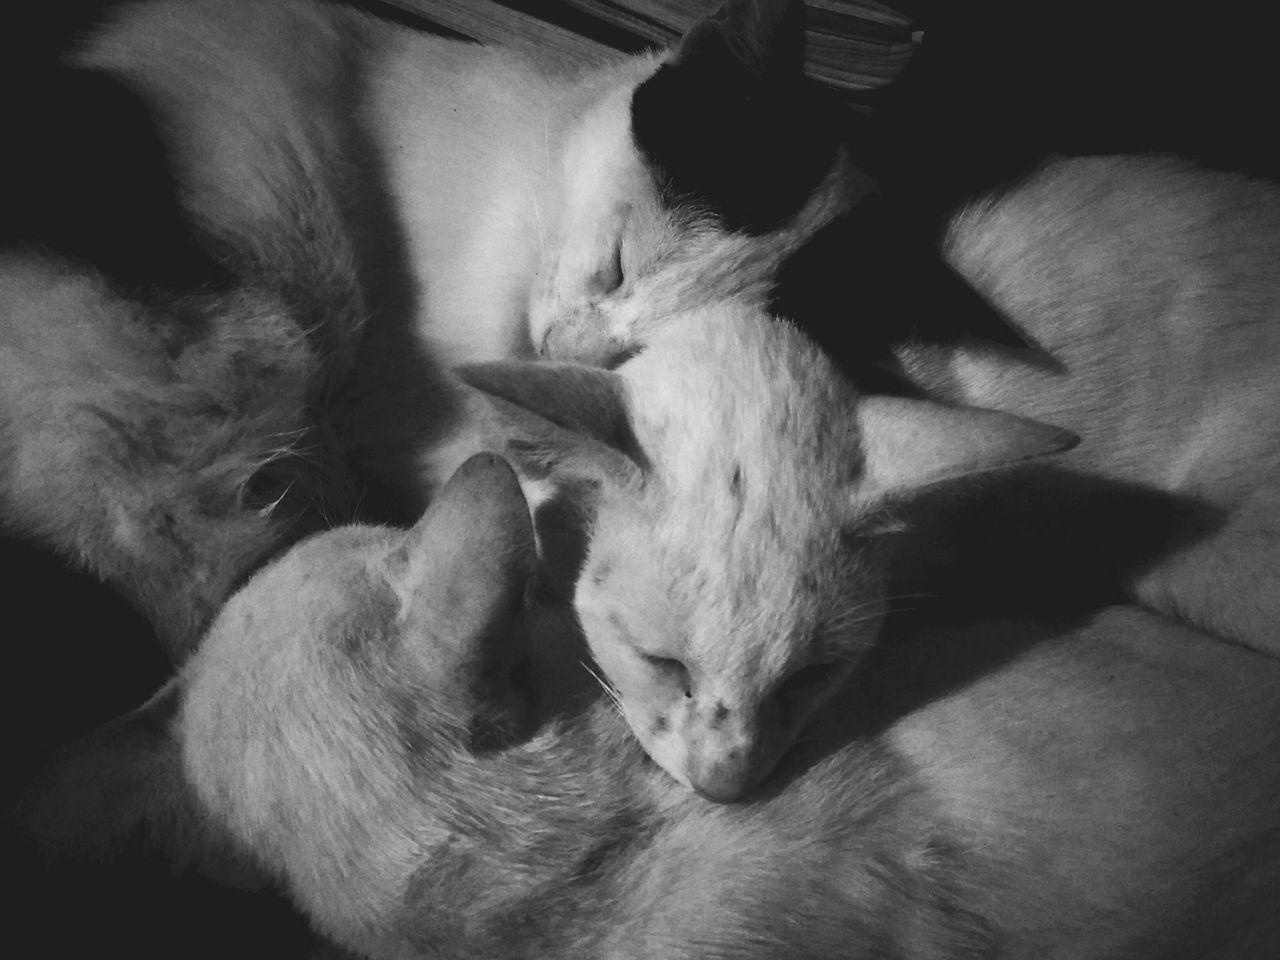 Domestic Animals Pets Three Cats Cats 🐱 Catsleep Catsleeps Catsleeping Cat Photography Cats Sleeping Style Blackandwhite Brothers Mammal Indoors  Animal Themes First Eyeem Photo